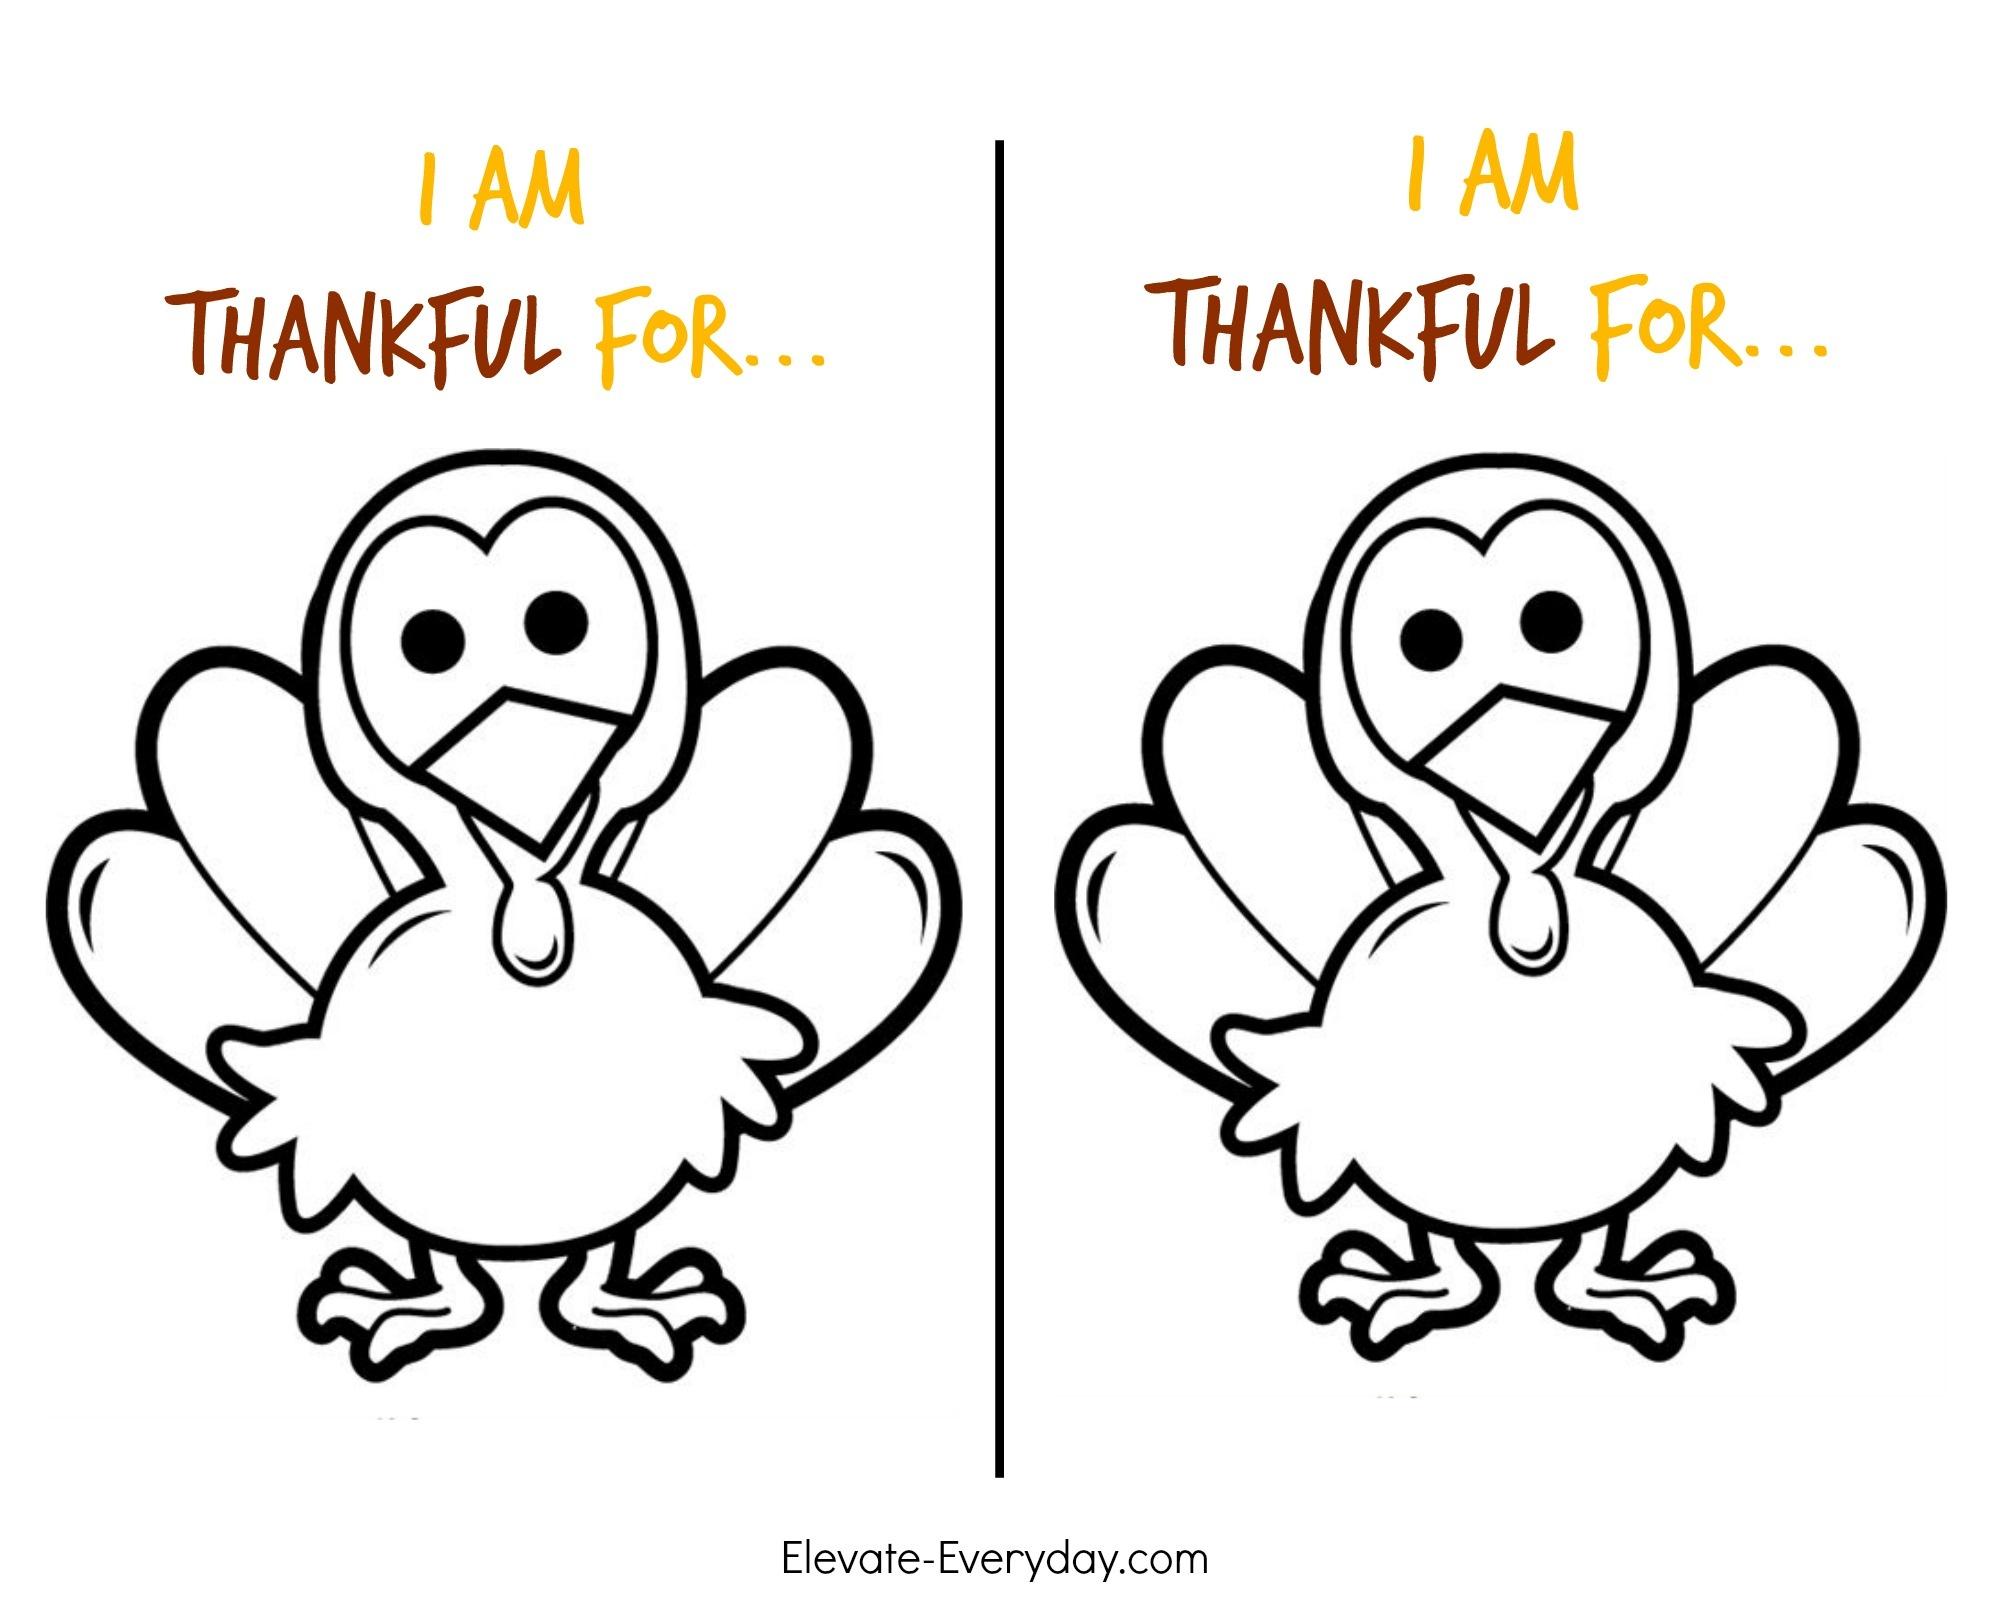 Free Printable Turkey Templates – Happy Easter & Thanksgiving 2018 - Free Printable Thanksgiving Turkey Template